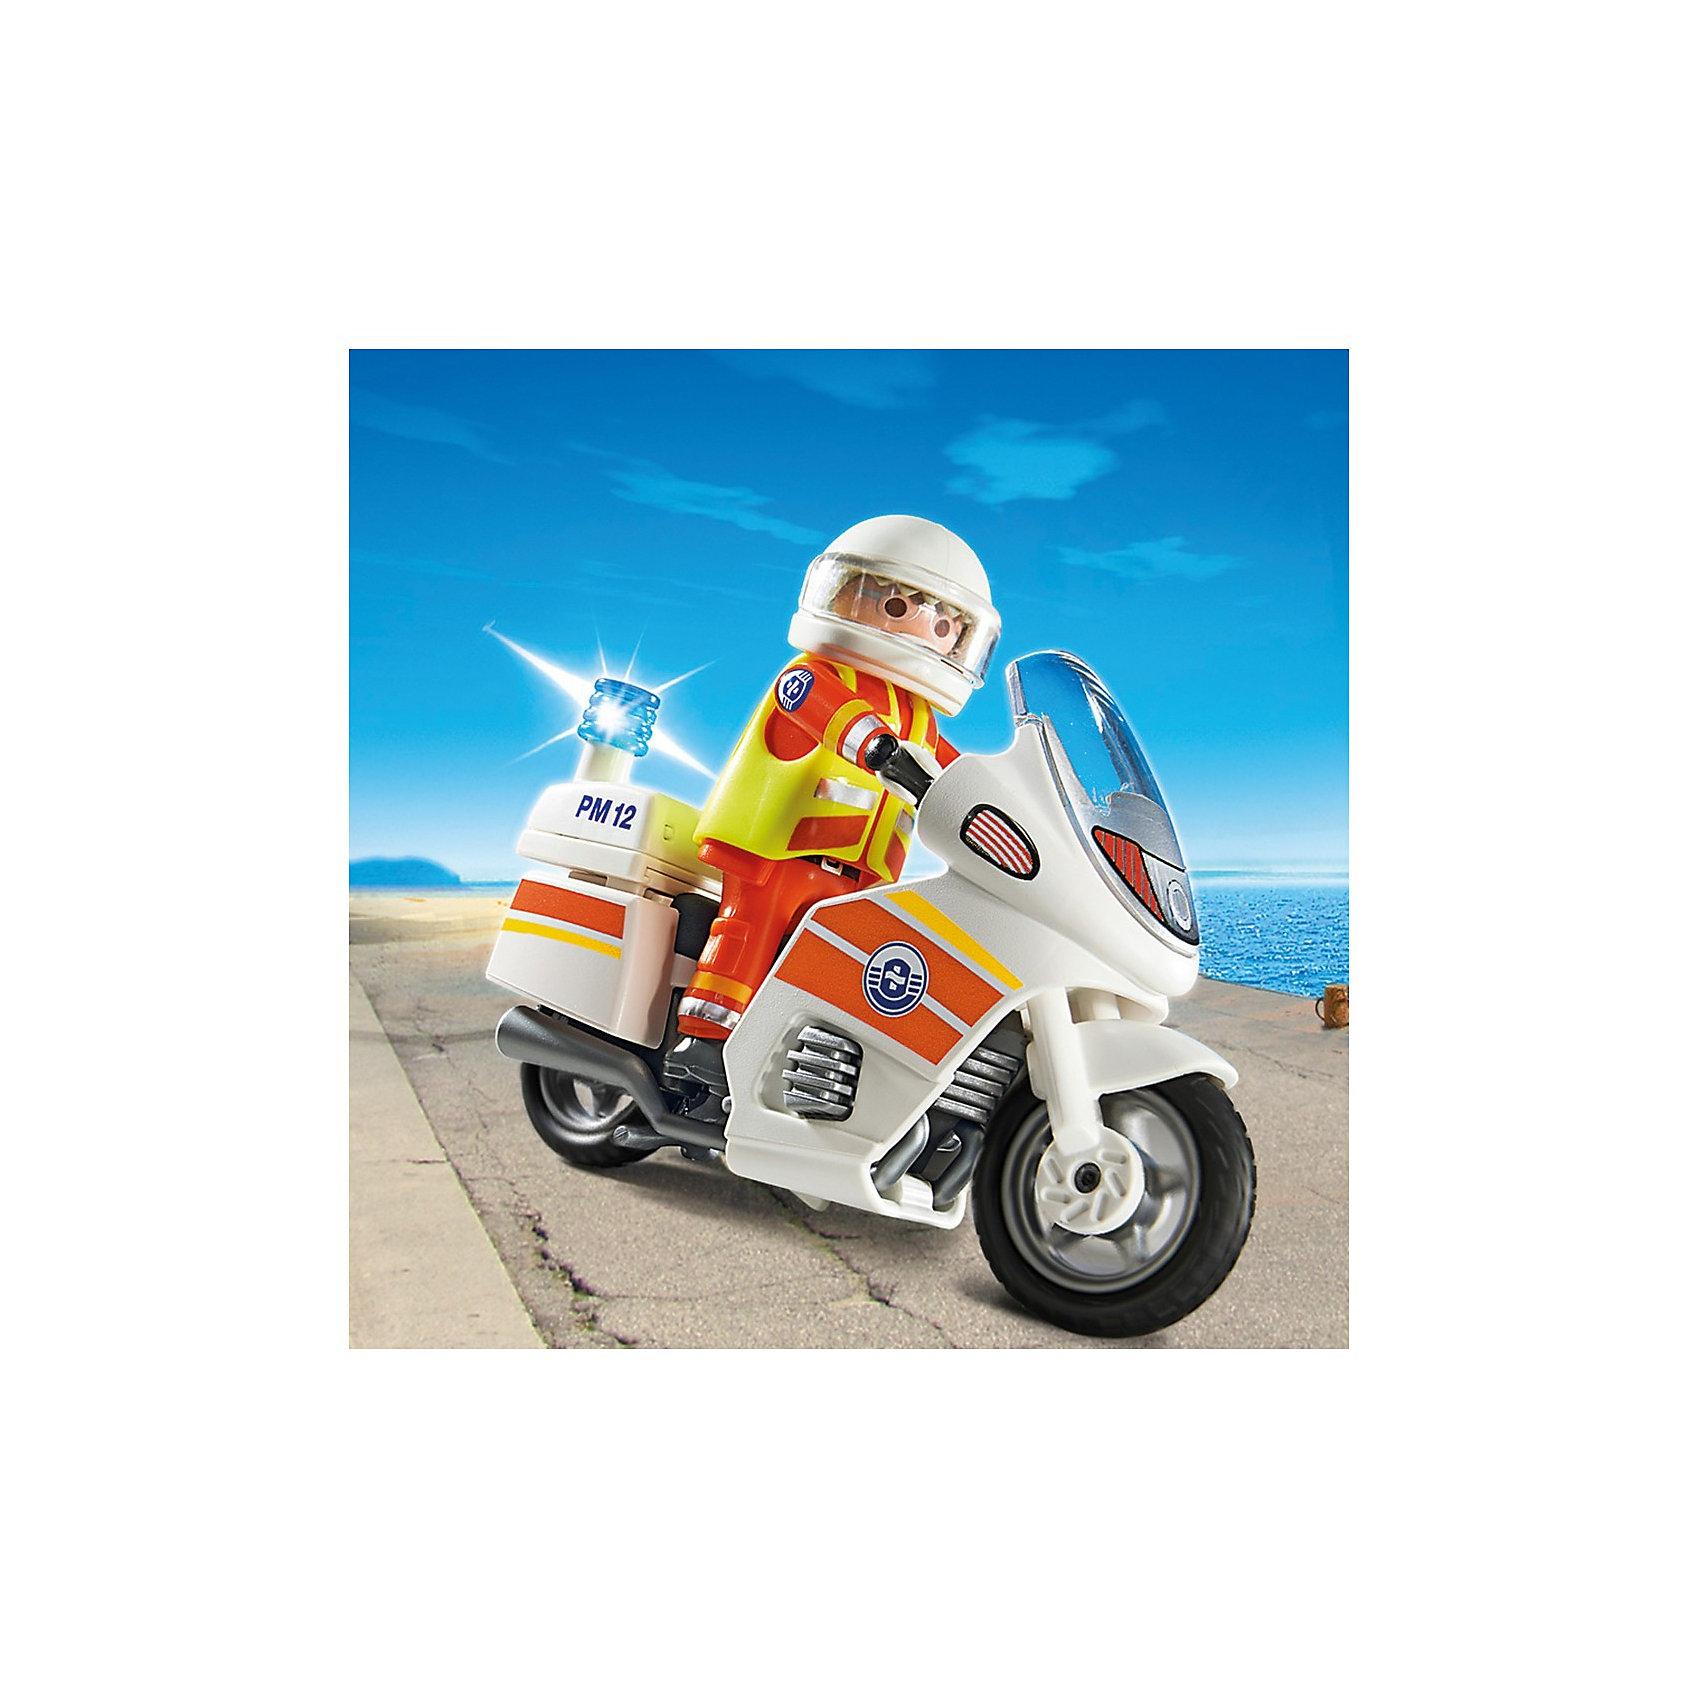 PLAYMOBIL® PLAYMOBIL 5544 Береговая охрана: Мотоцикл первой помощи с мигалкой какой мотоцикл до 60000рублей